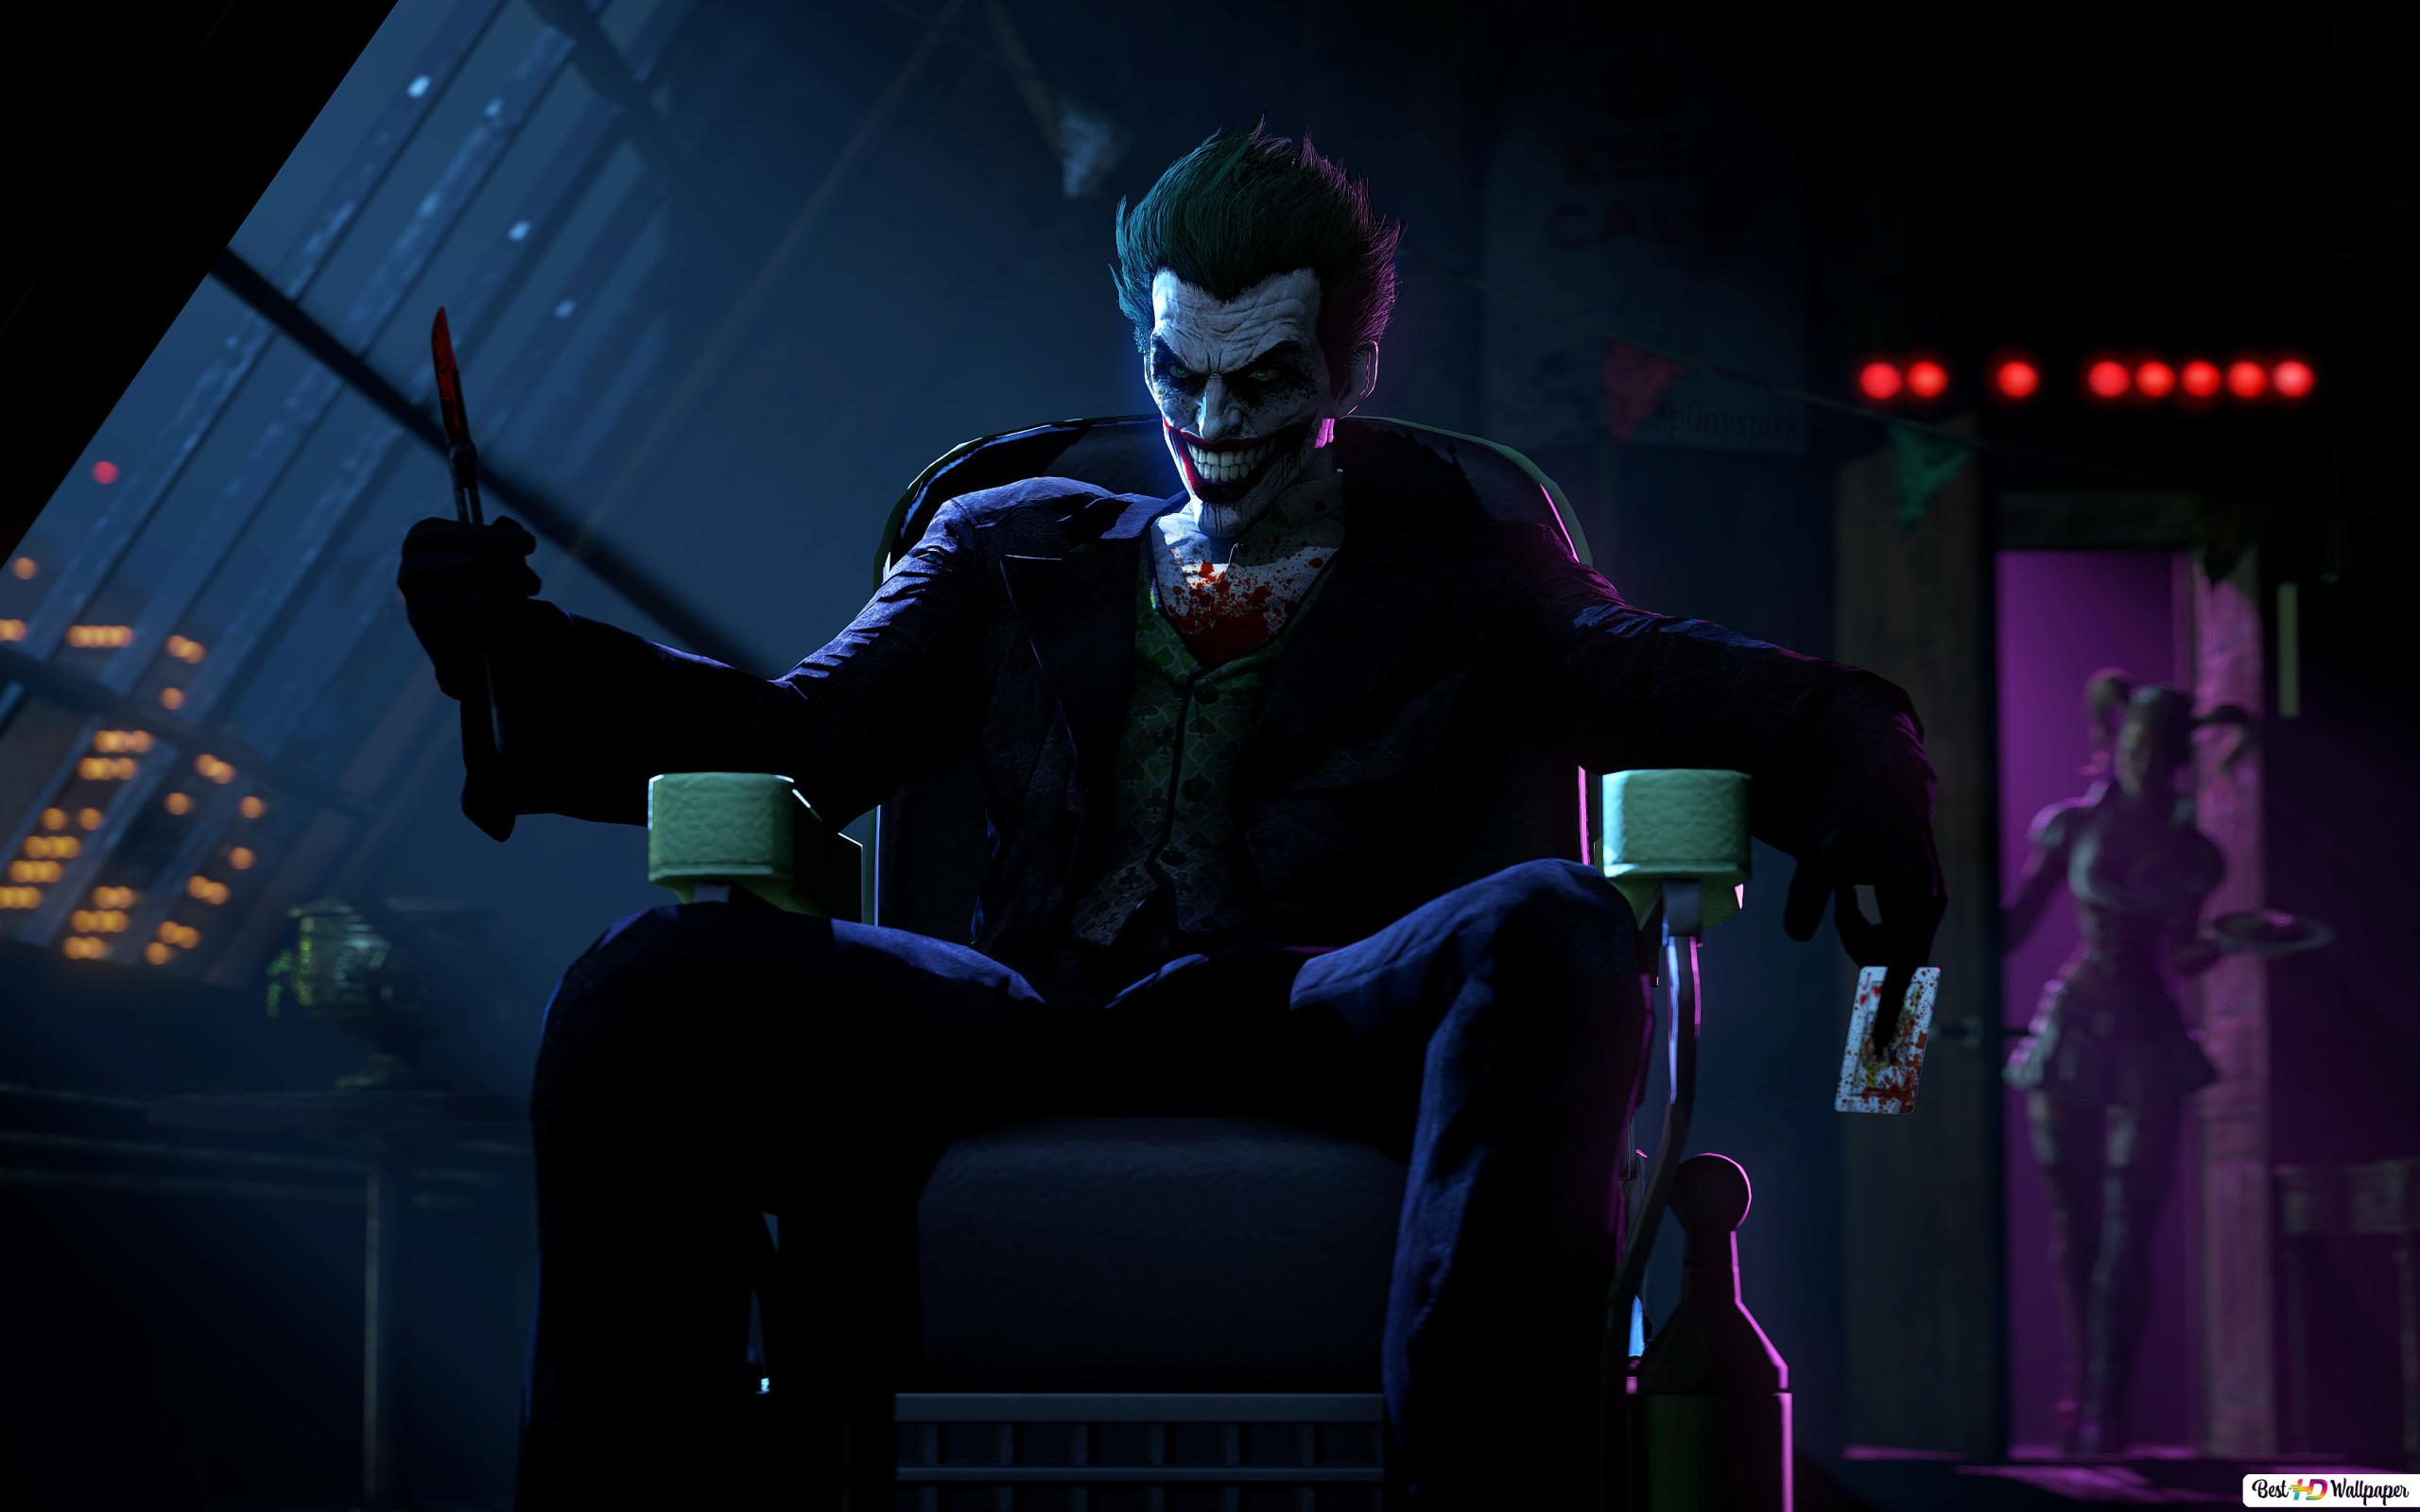 batman arkham origins joker hd